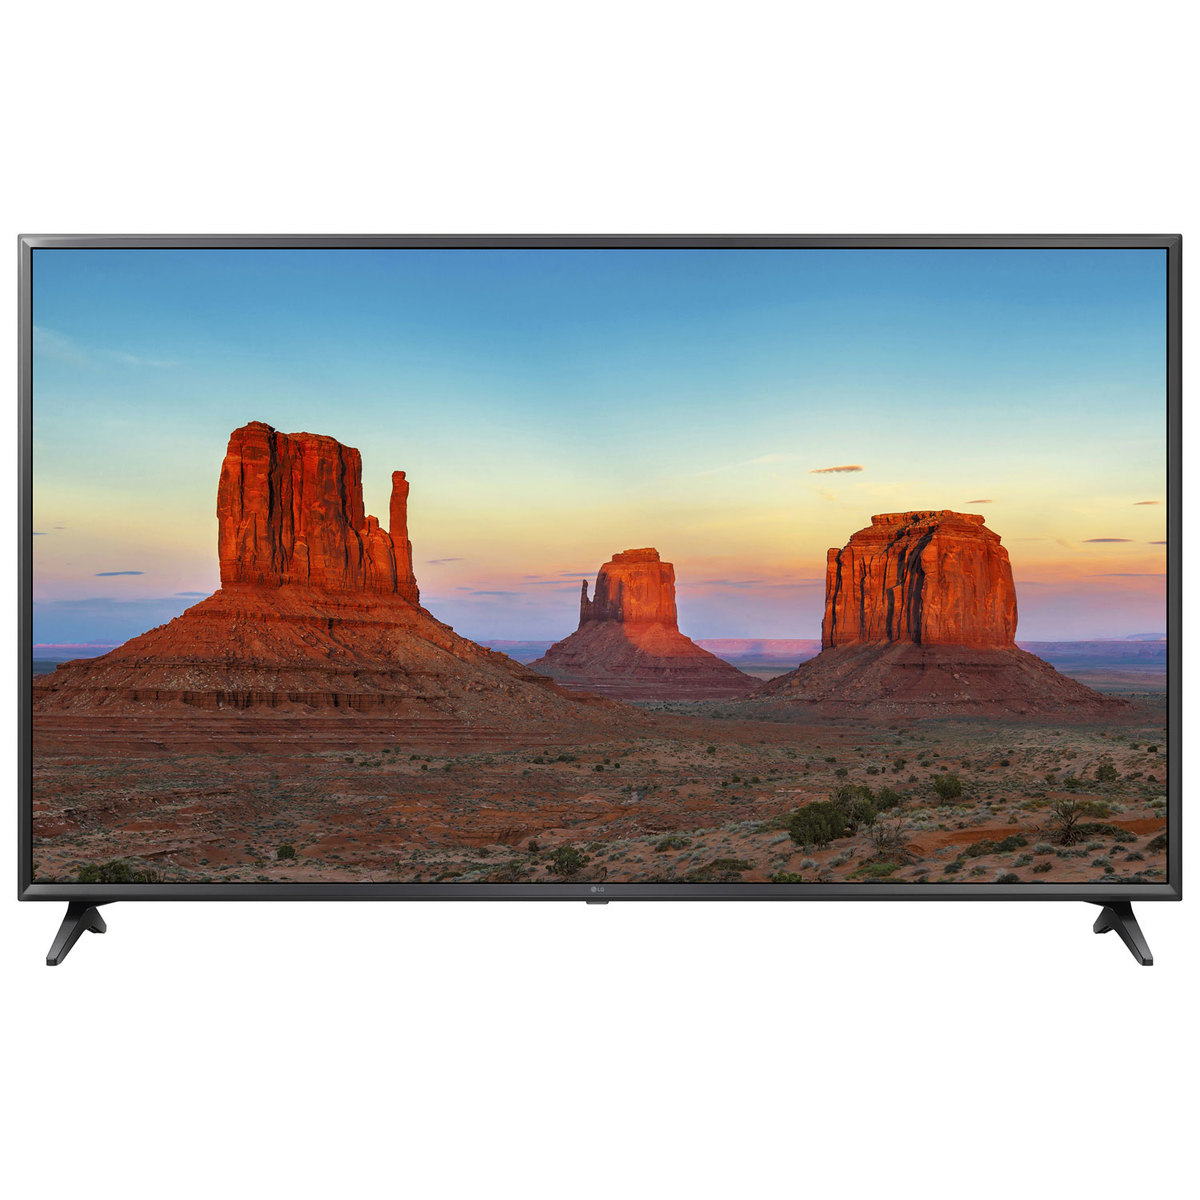 טלוויזיה LG 50UK6300Y 4K 50 אינטש